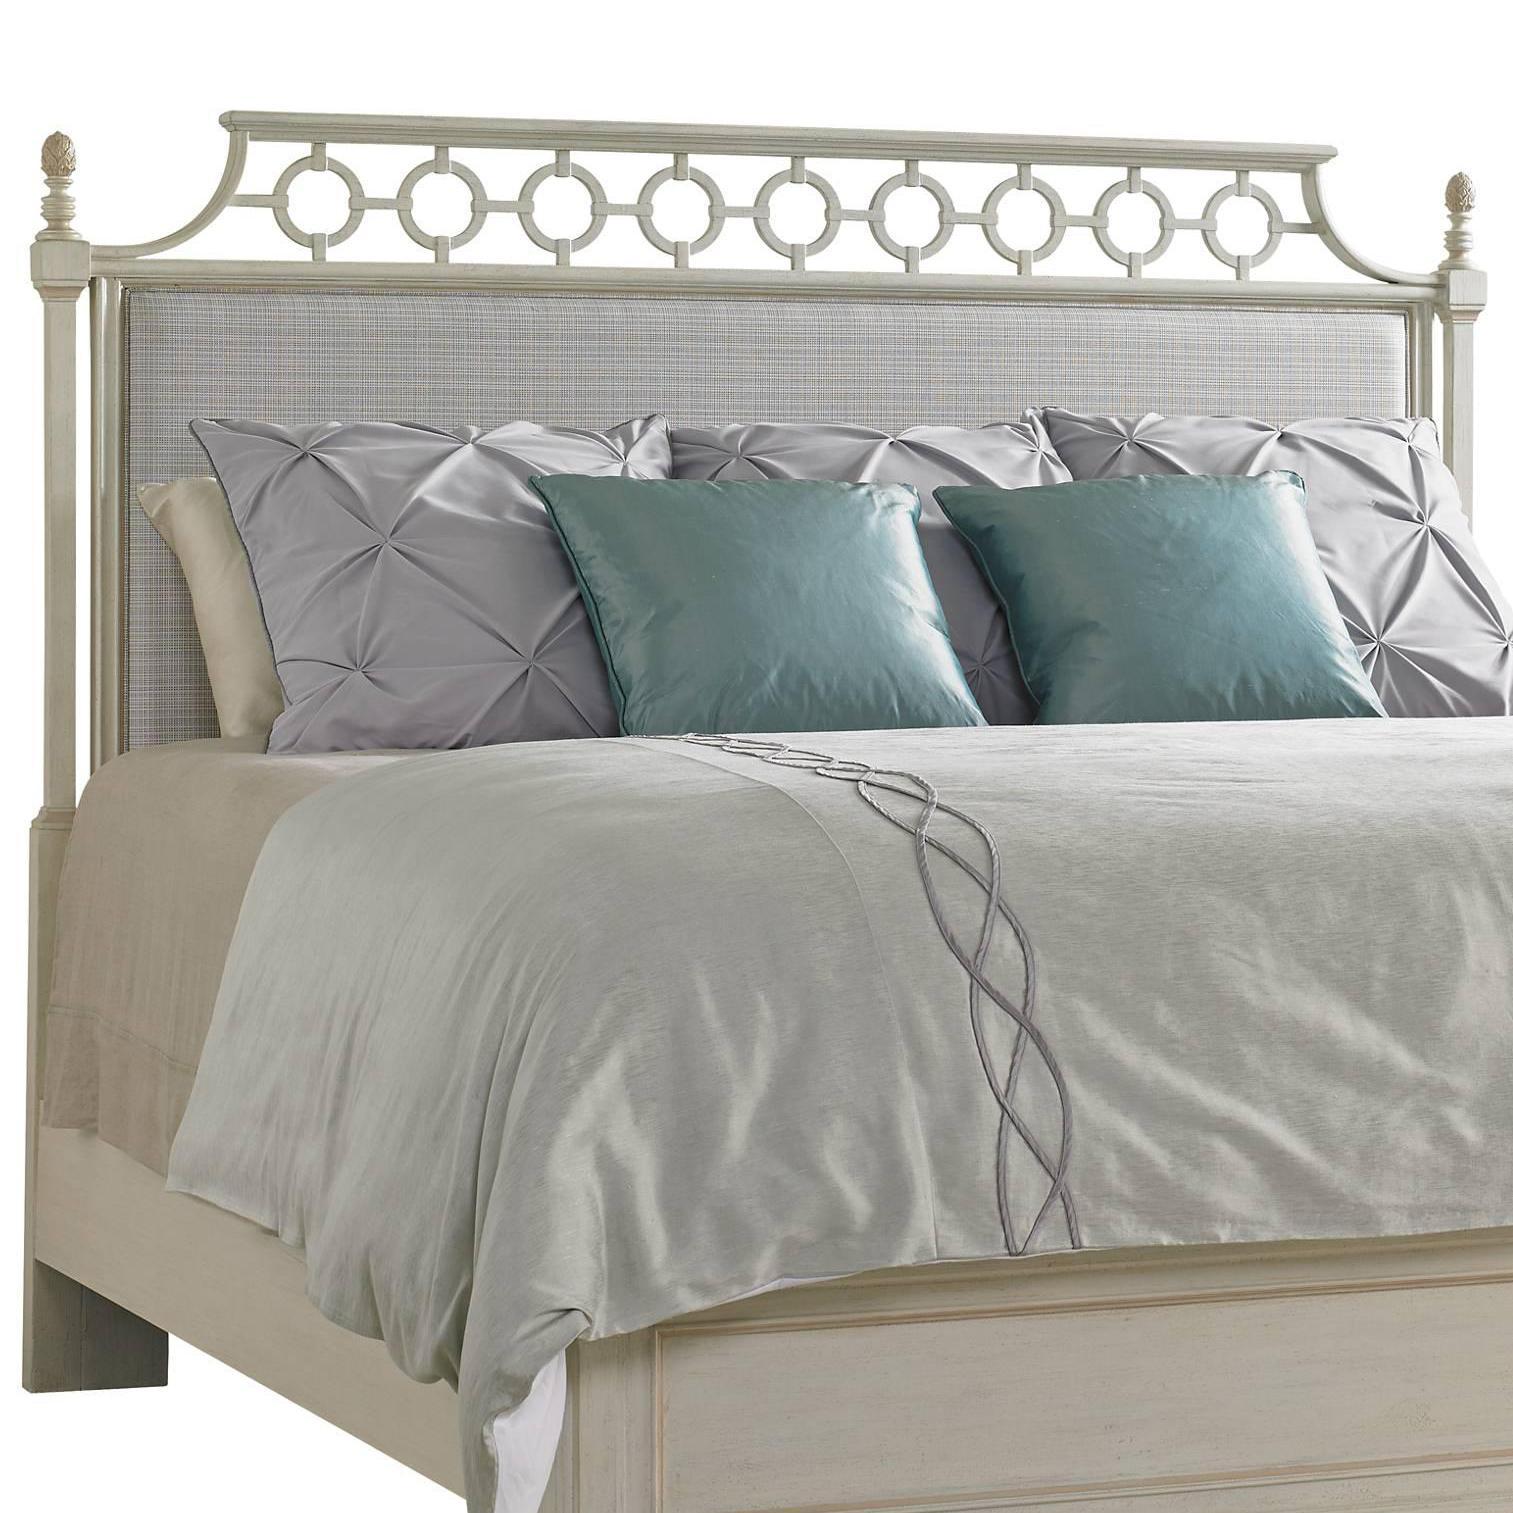 Stanley Furniture Preserve Queen Botany Upholstered Headboard - Item Number: 340-23-140